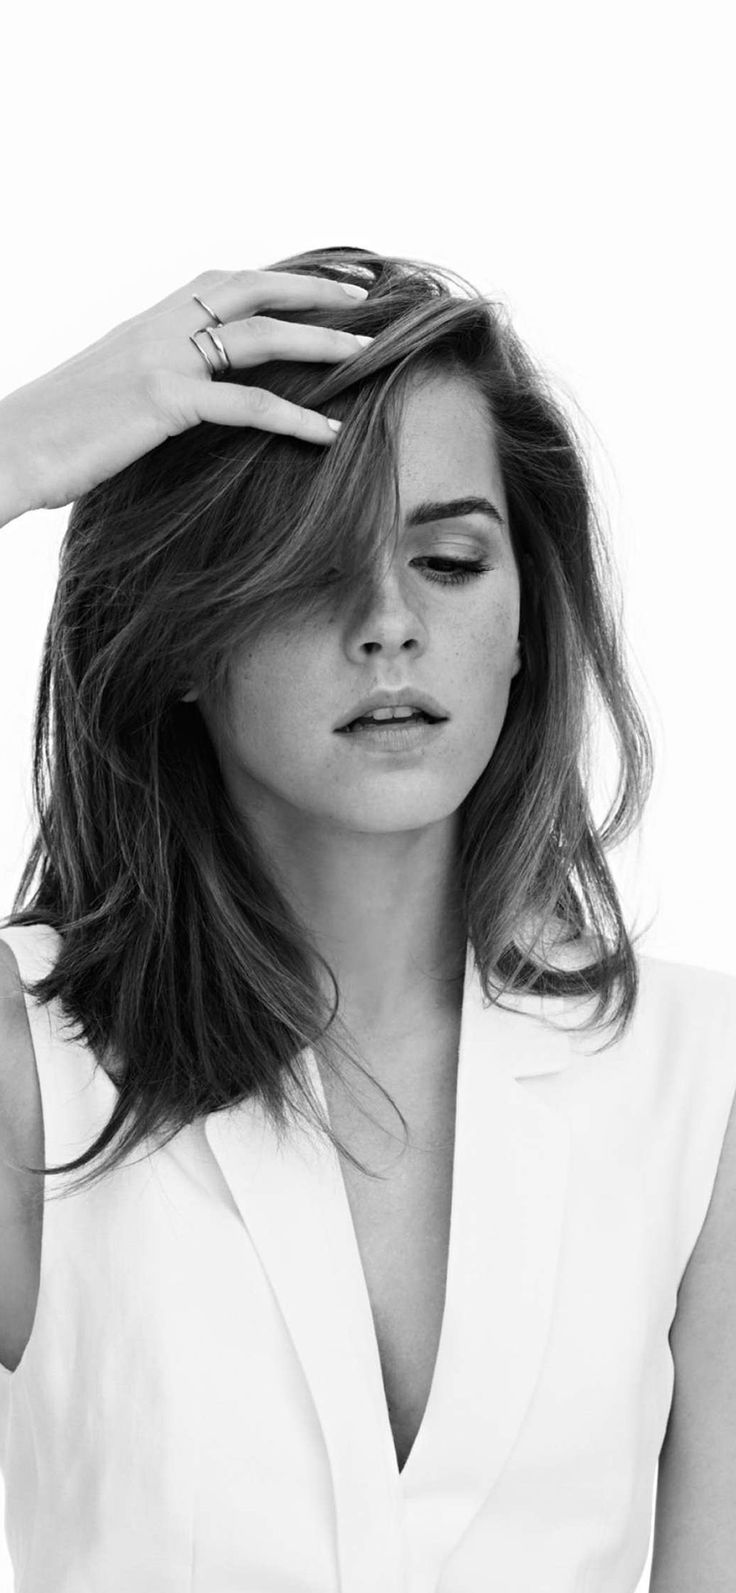 Emma Watson Rich Quality HD x All For